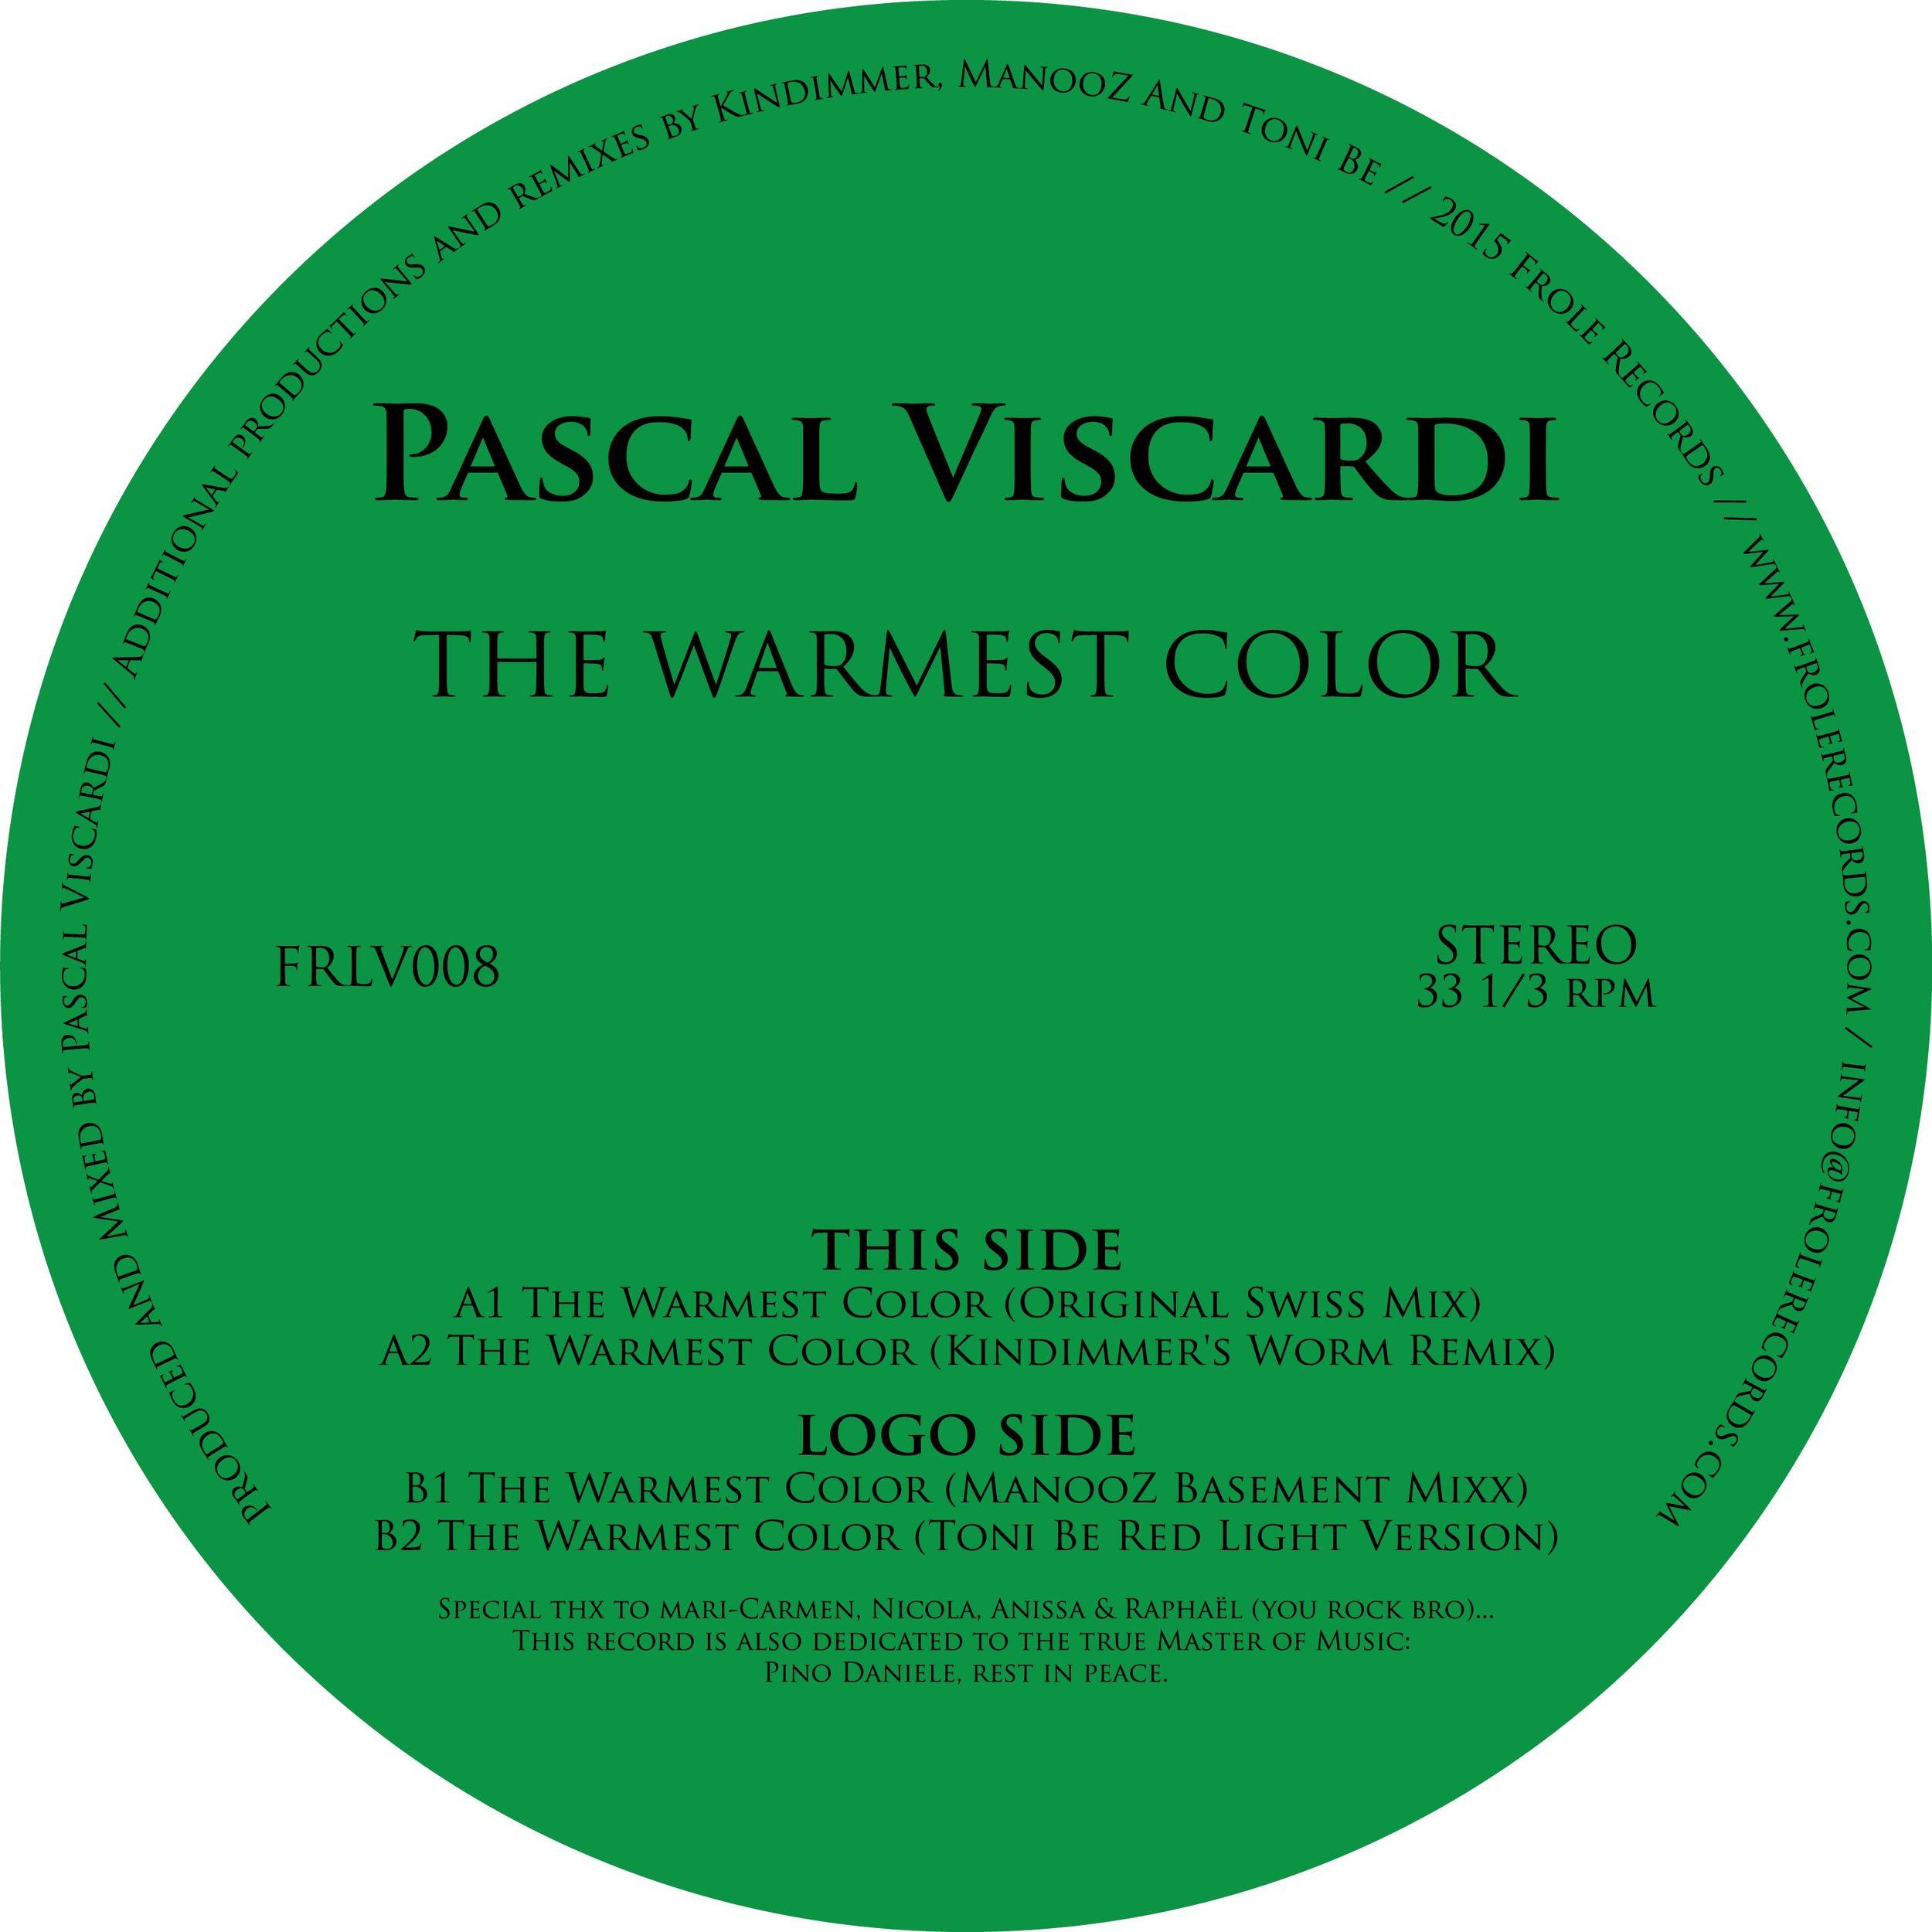 Pascal Viscardi - The Warmest Color [FRLV008]